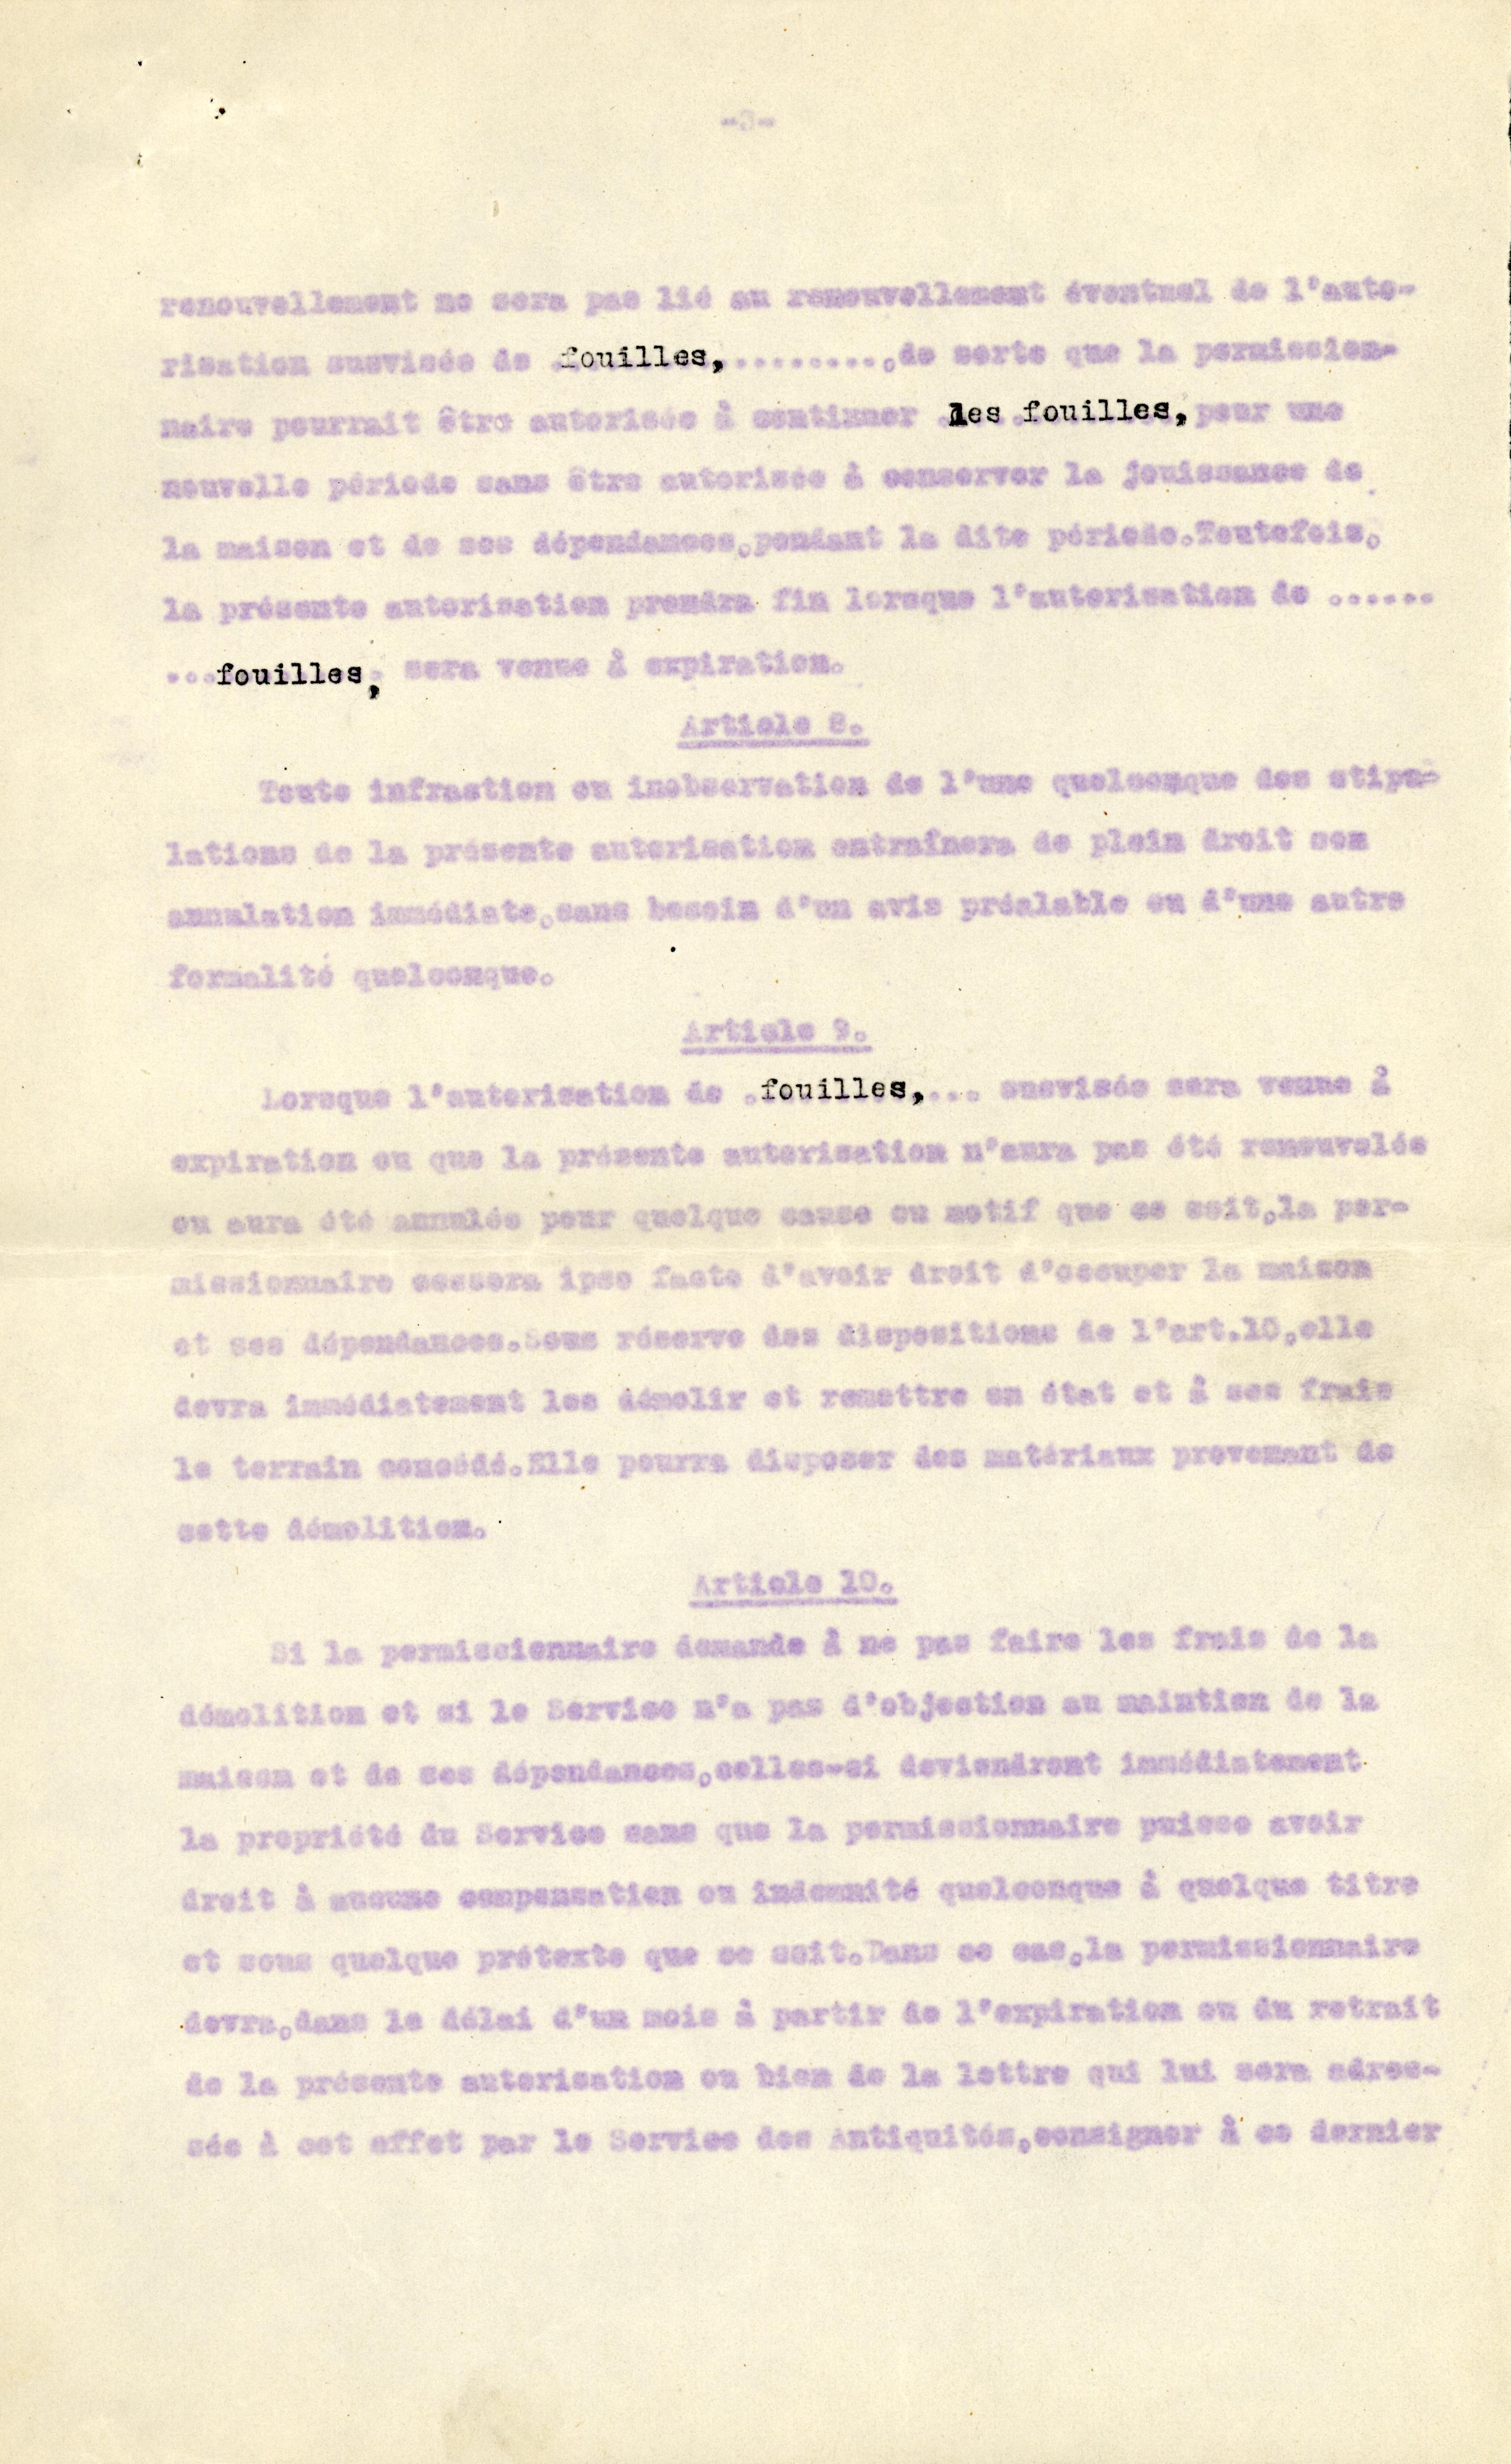 1926-39 correspondence with Antiquities Service DIST.50.08c